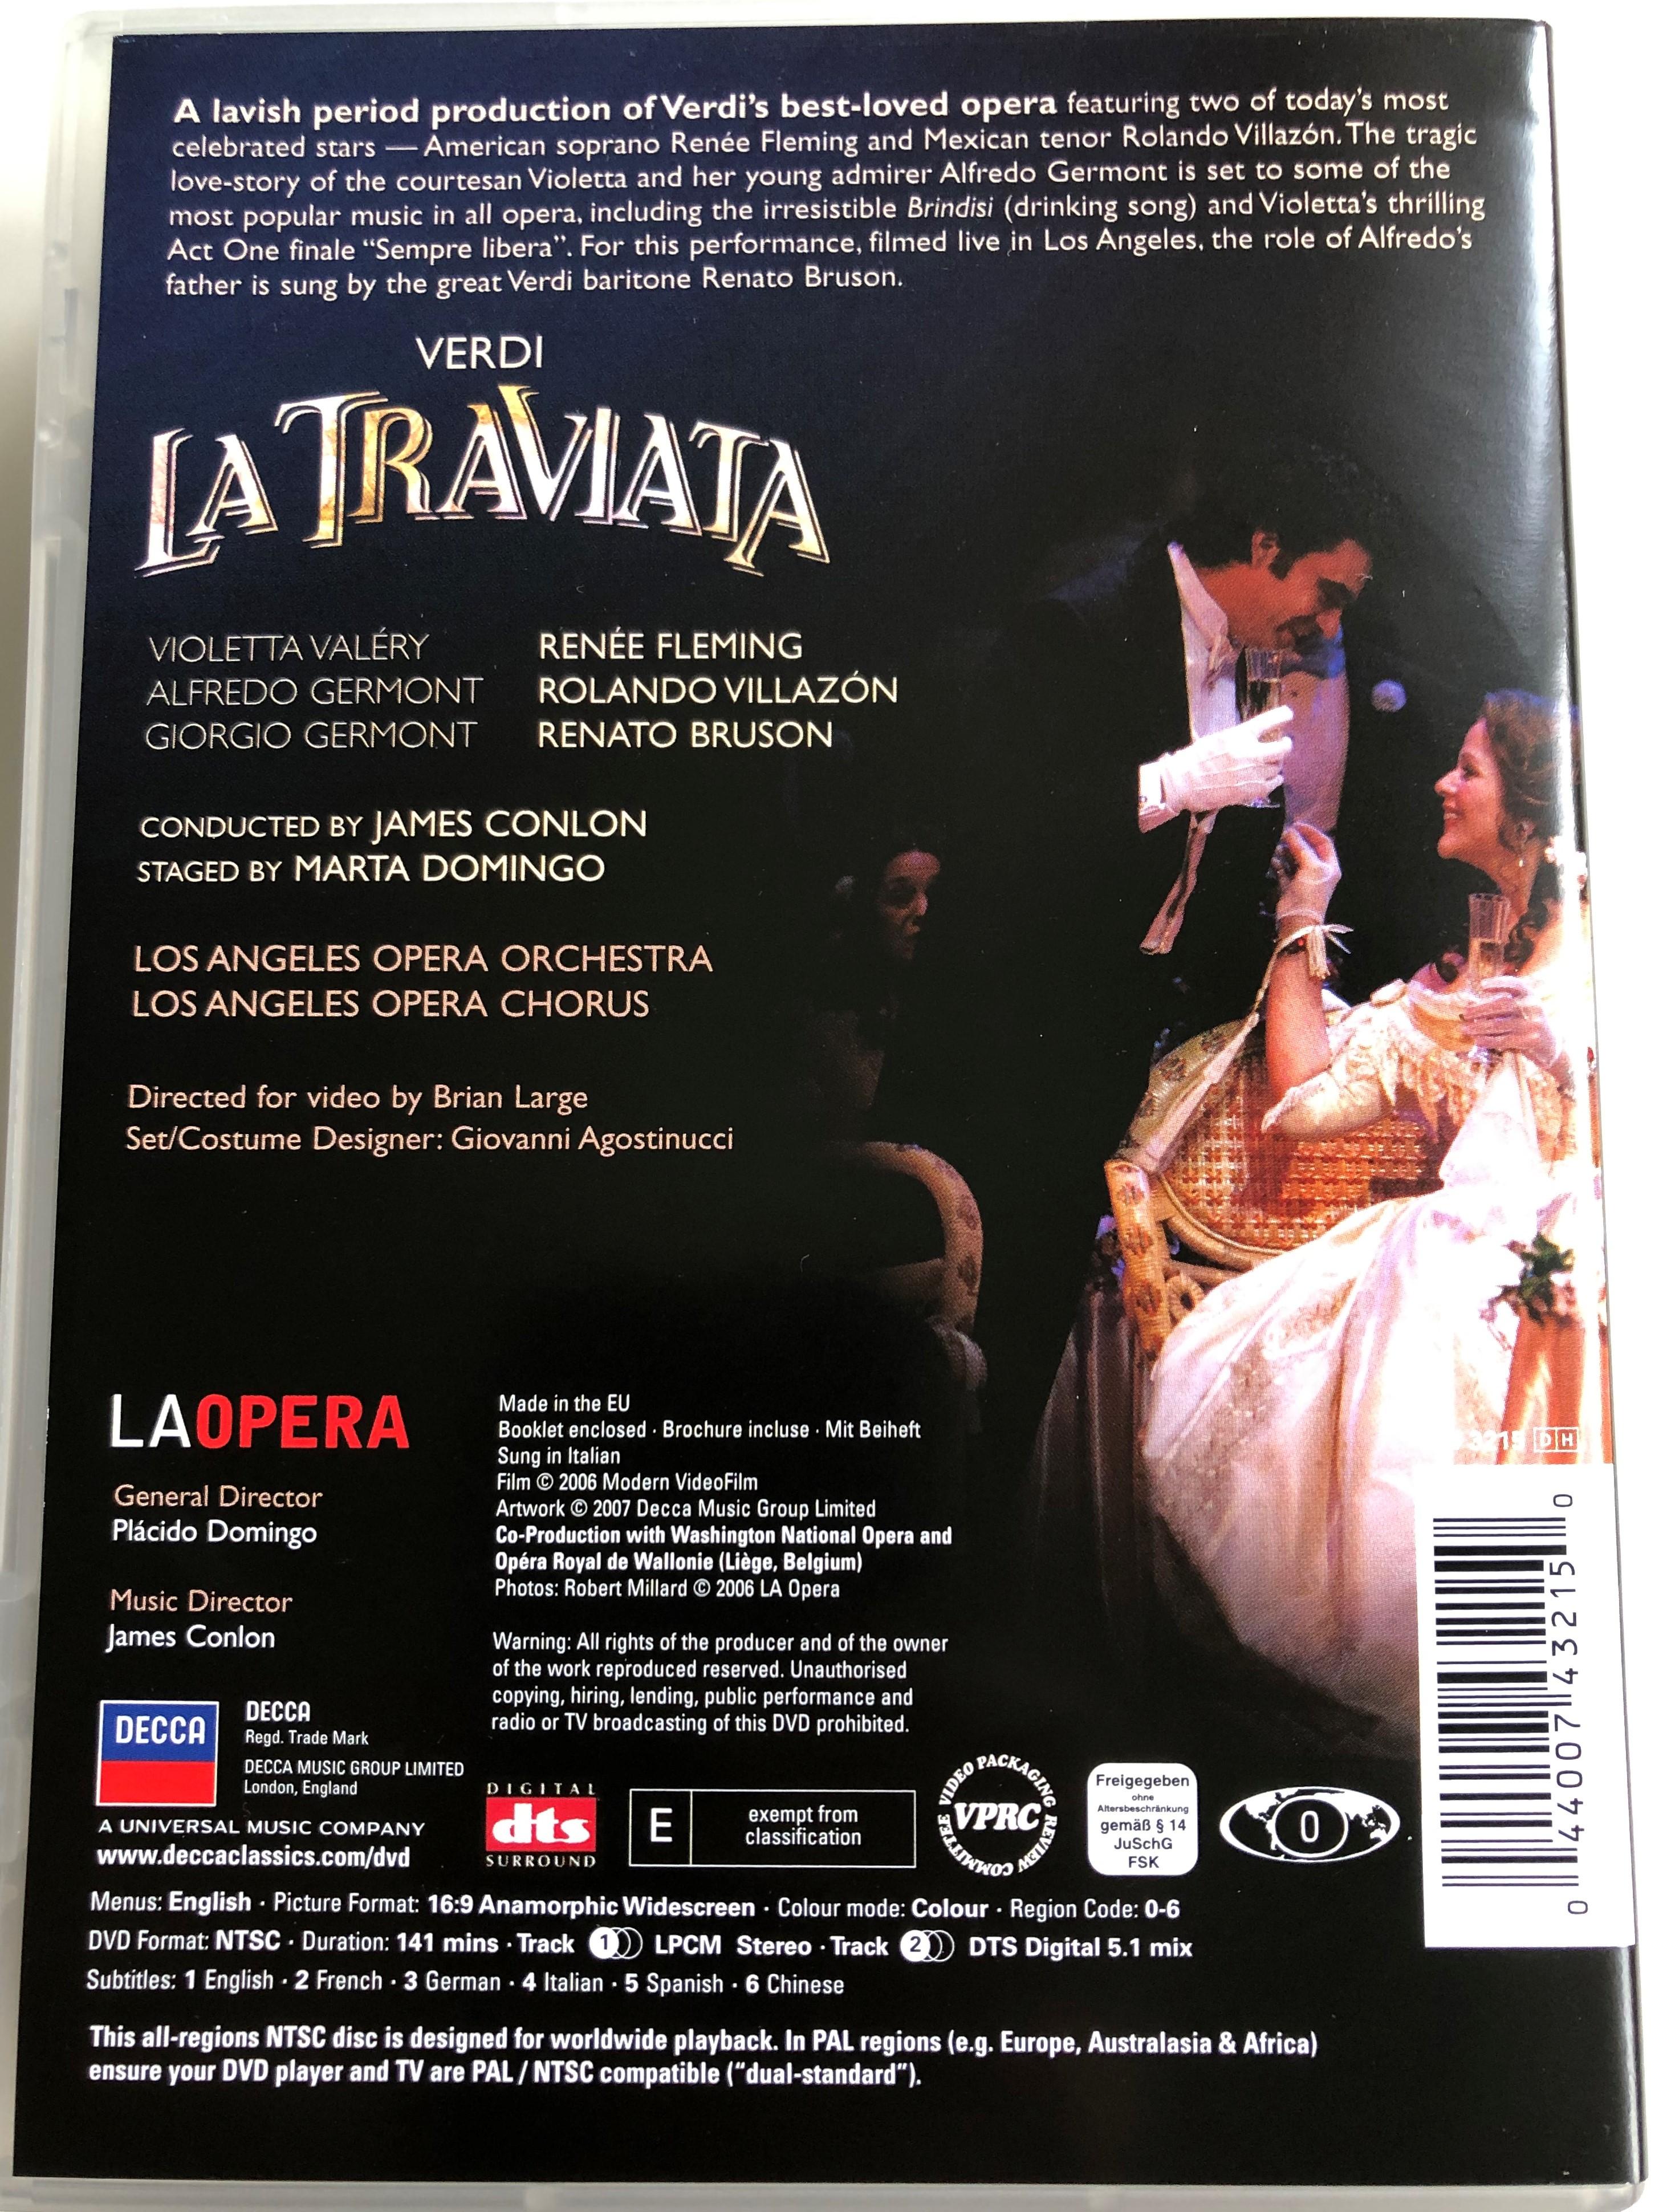 giuseppe-verdi-la-traviata-dvd-2006-directed-by-brian-large-pl-cido-domingo-3.jpg